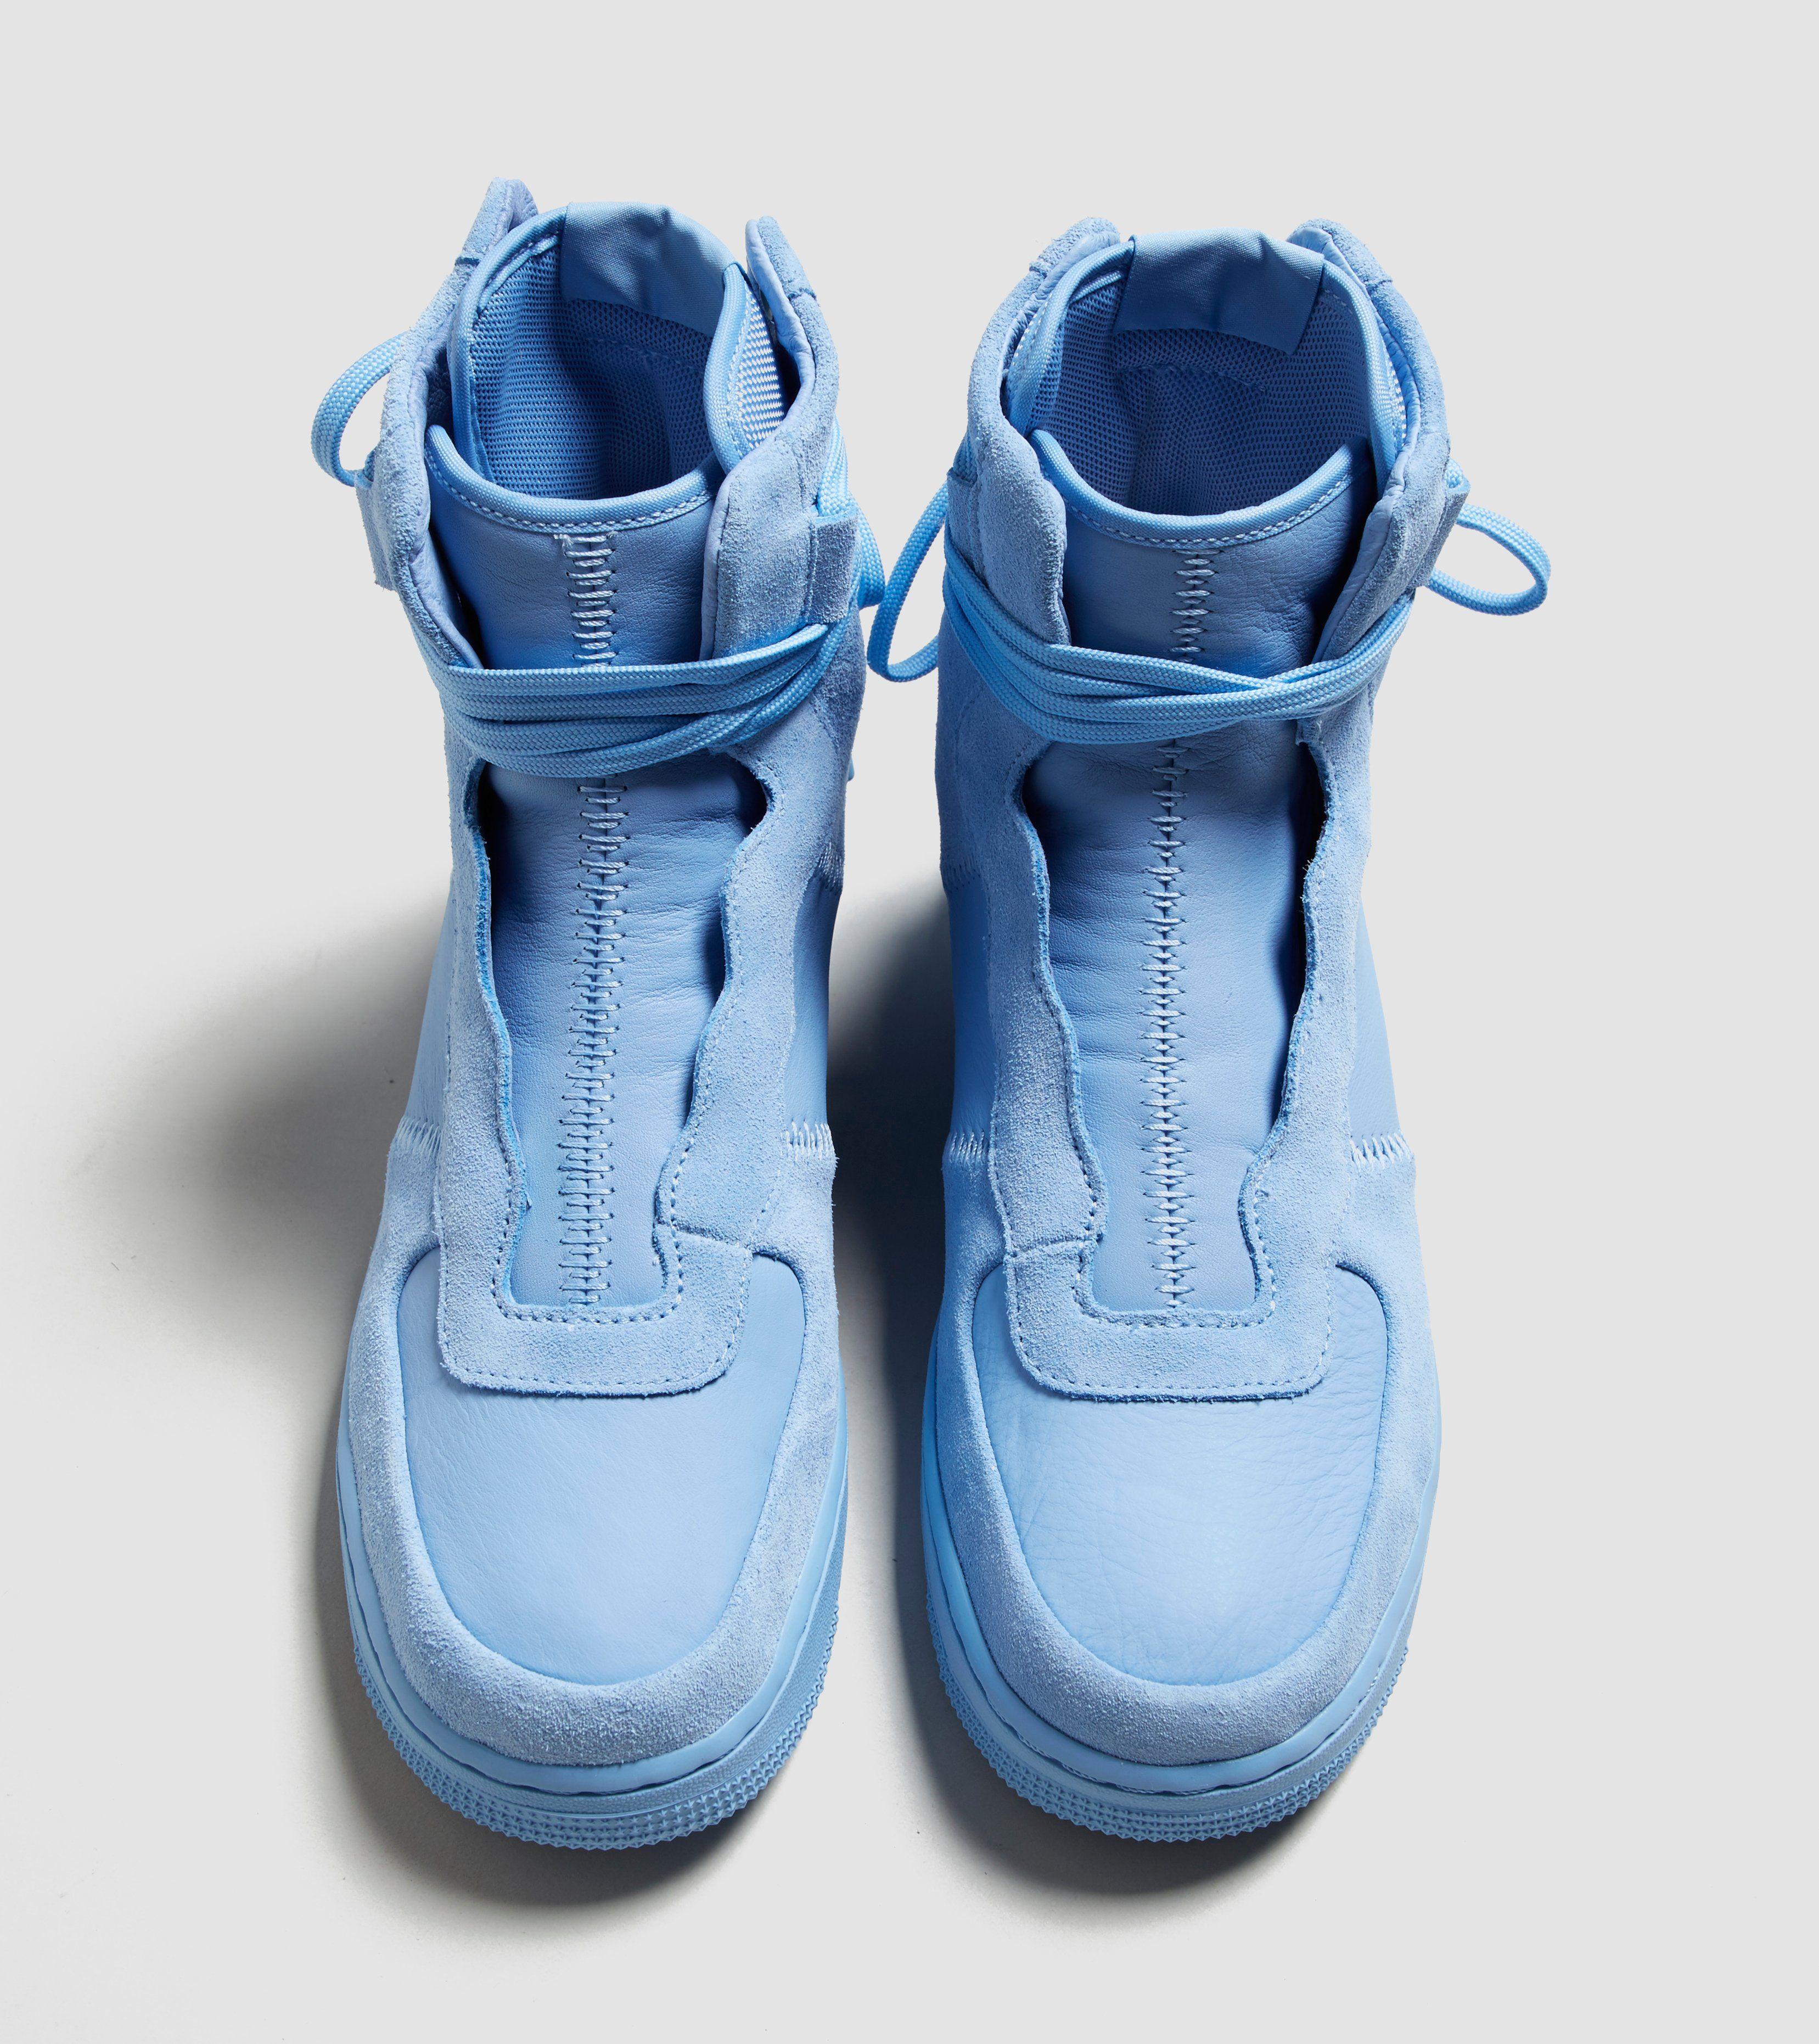 Nike Air Force 1 Rebel XX Women's